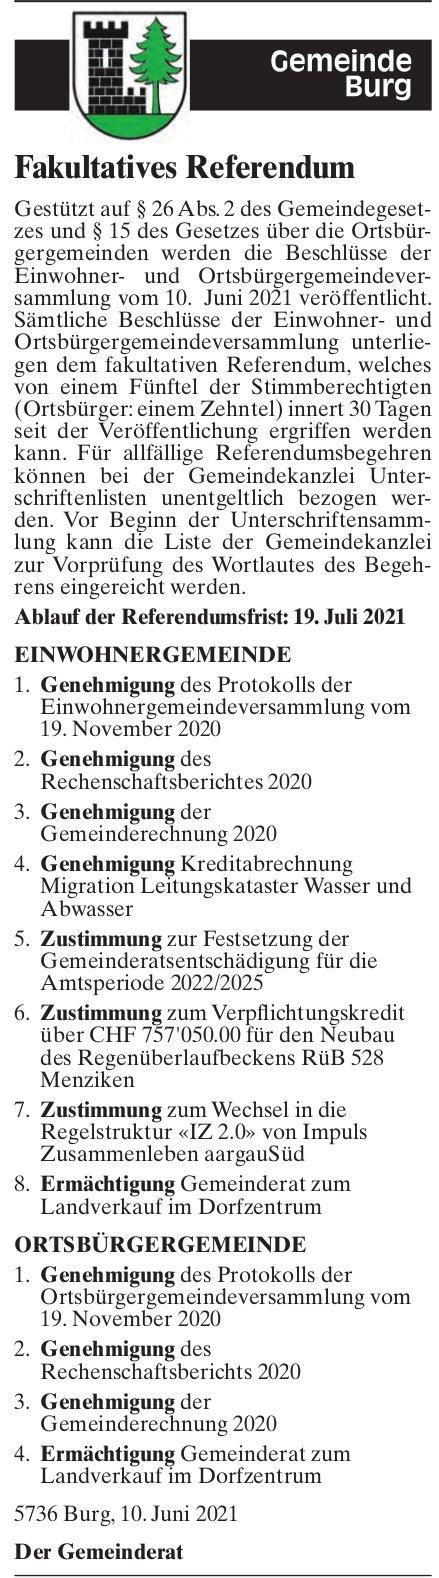 Burg - Fakultatives Referendum